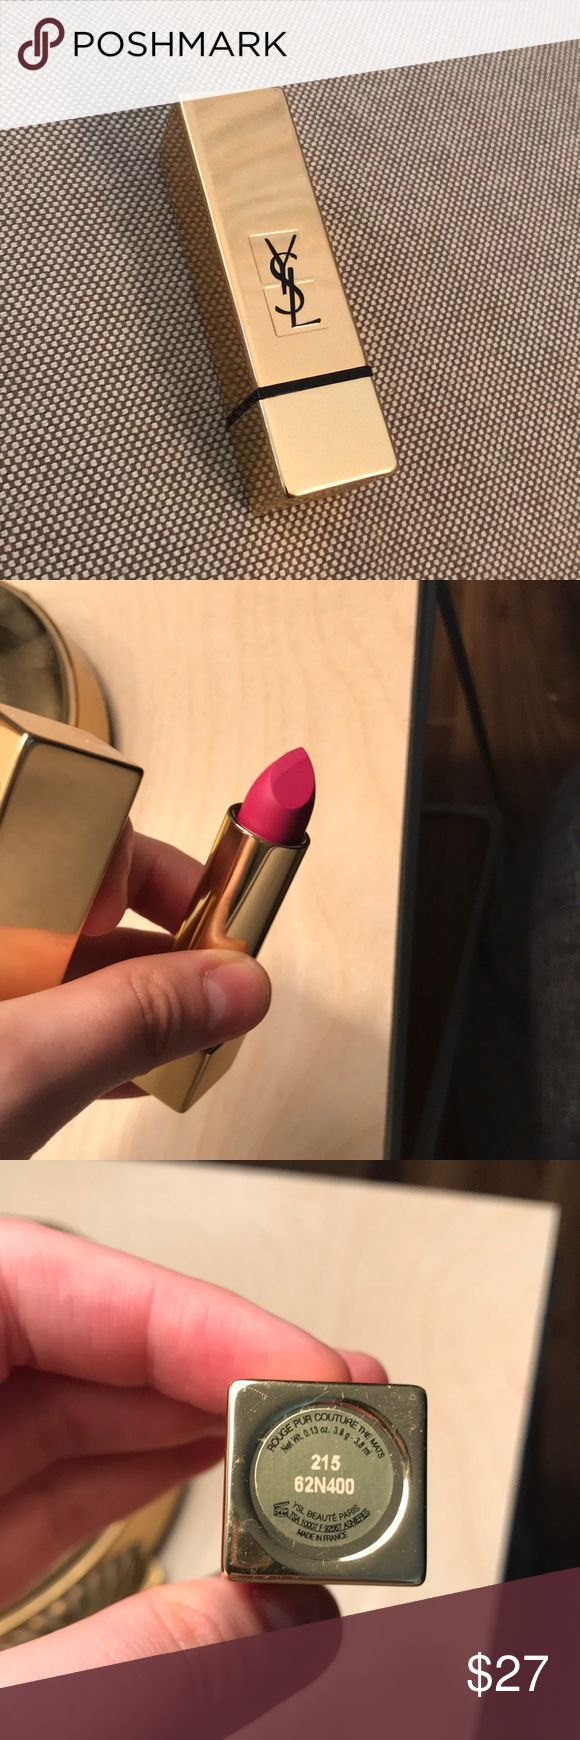 YSL lipstick Ysl lipstick, Lipstick, Yves saint laurent